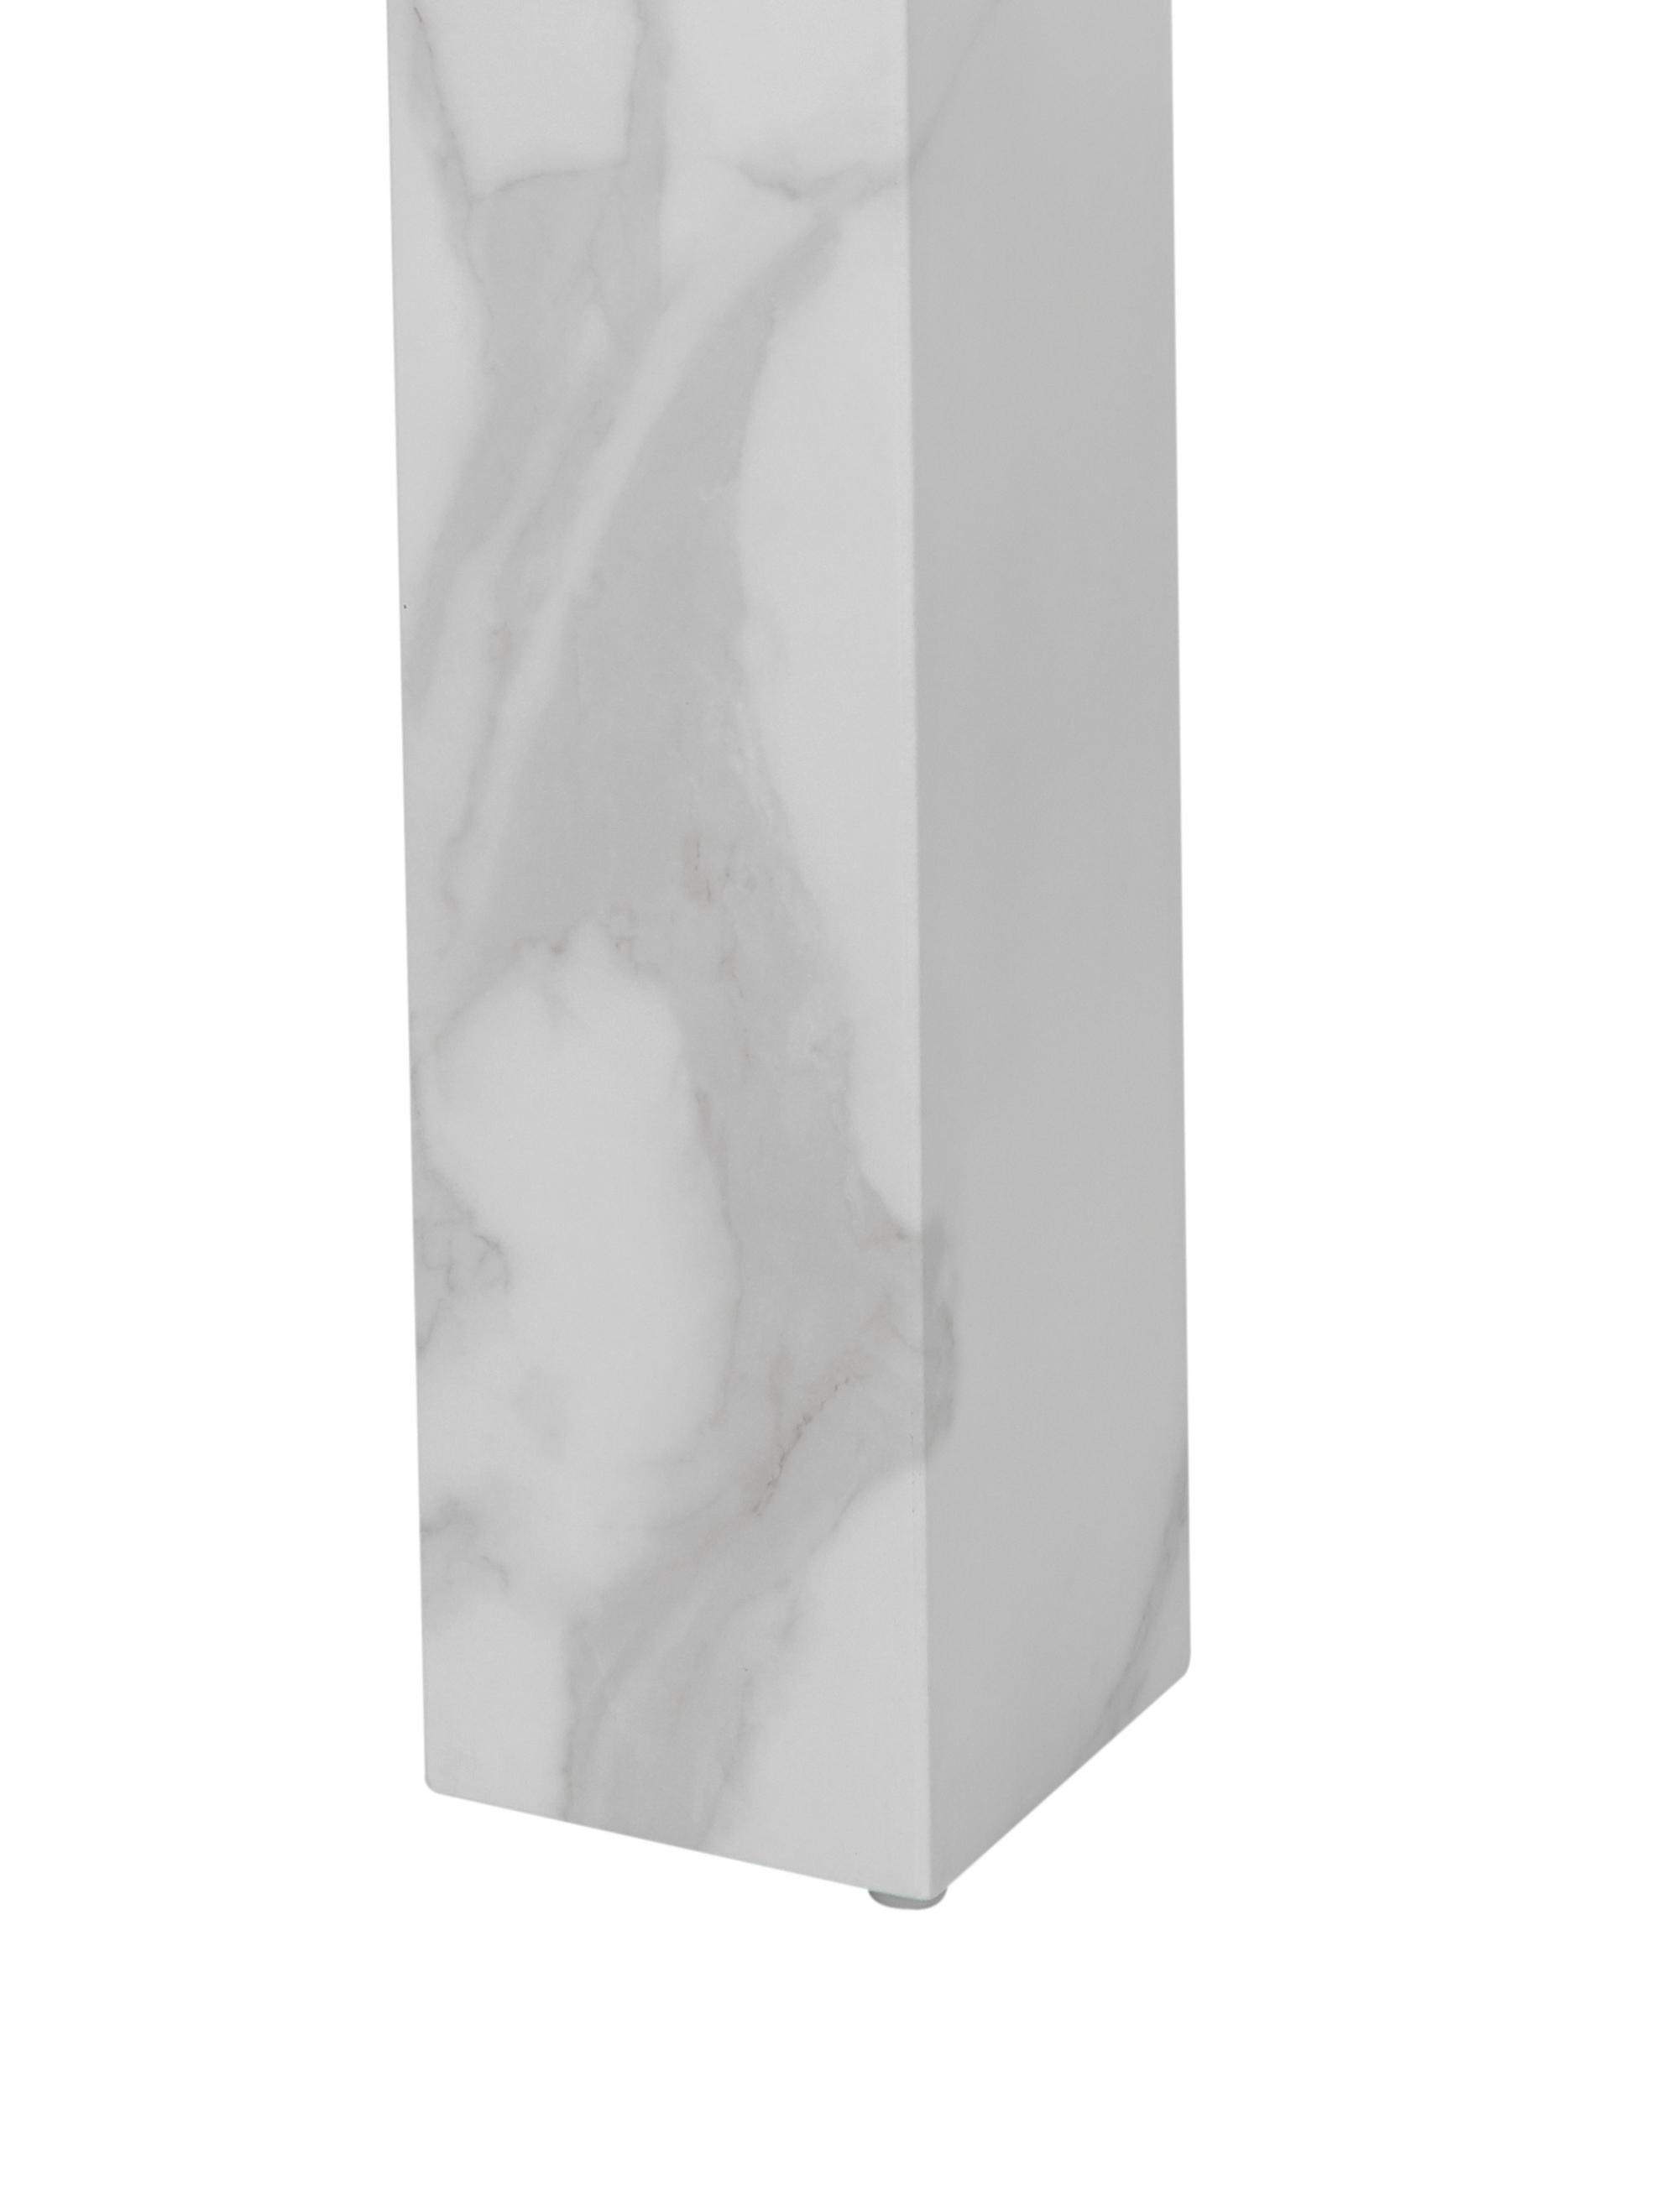 Table blanche aspect marbre Carl, Blanc marbré, brillant